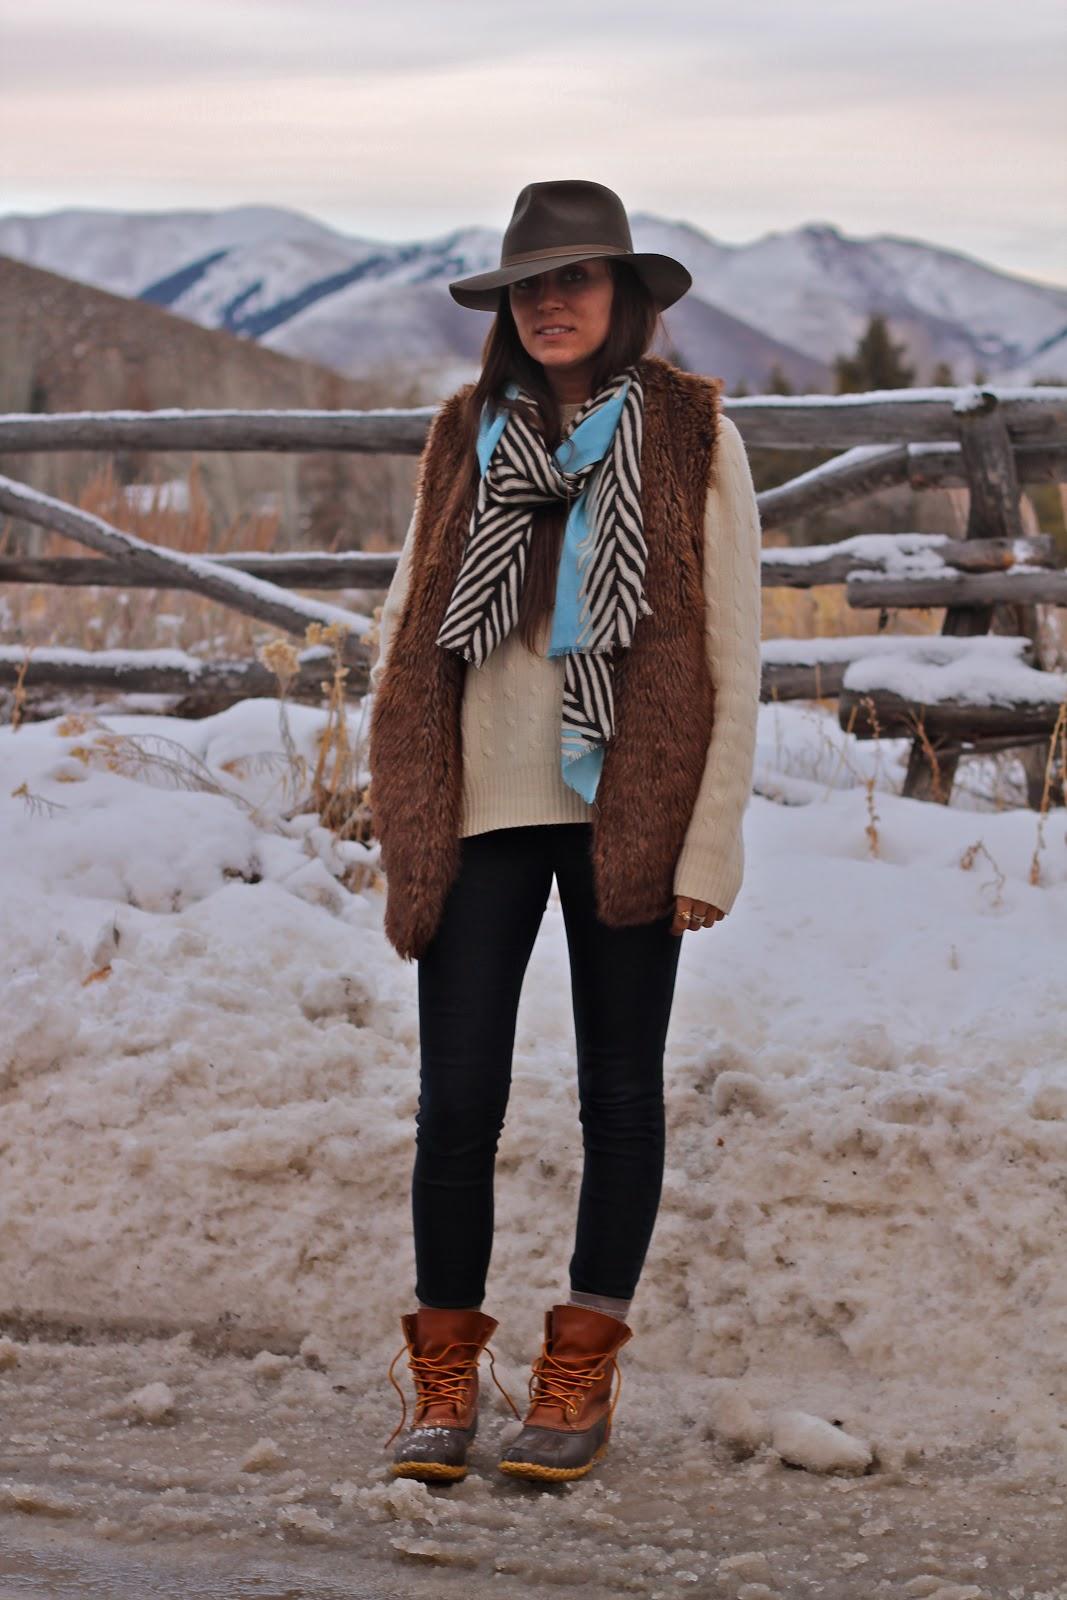 Popular LL Bean 9 M Womens Boots Black Suede Fleece Insulated Winter Side Zip